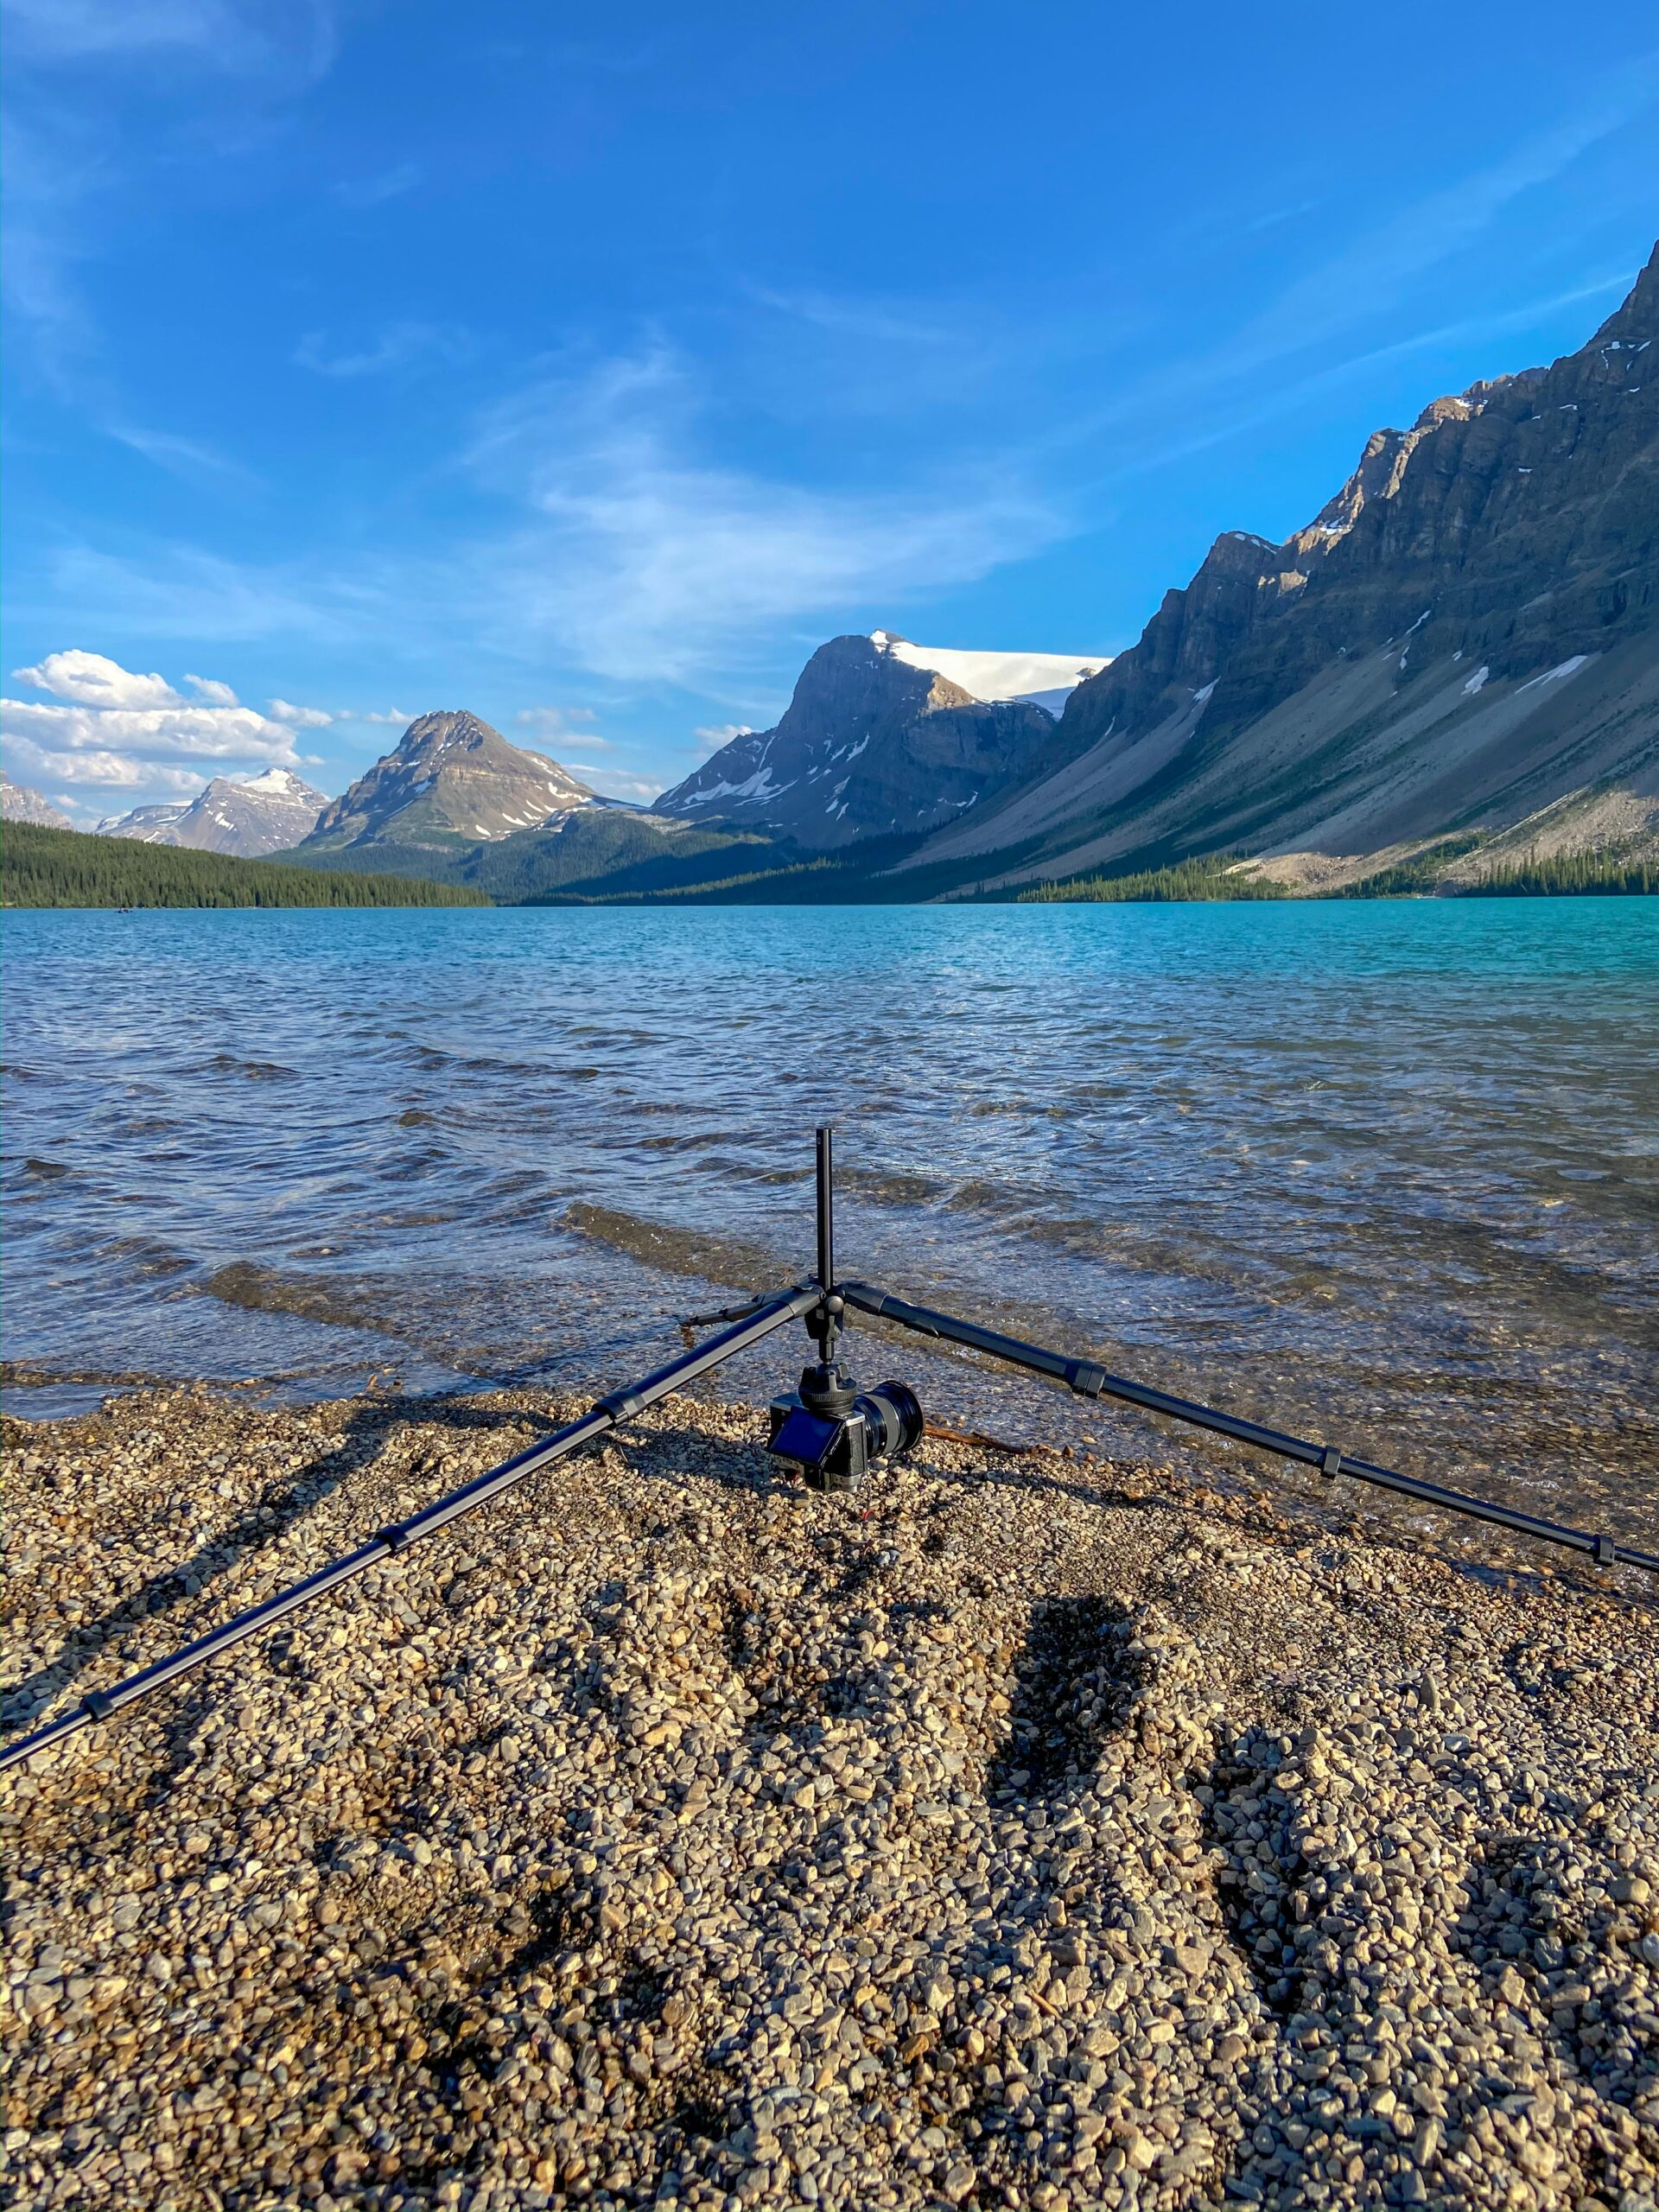 Peak Design Travel Tripod at bow Lake